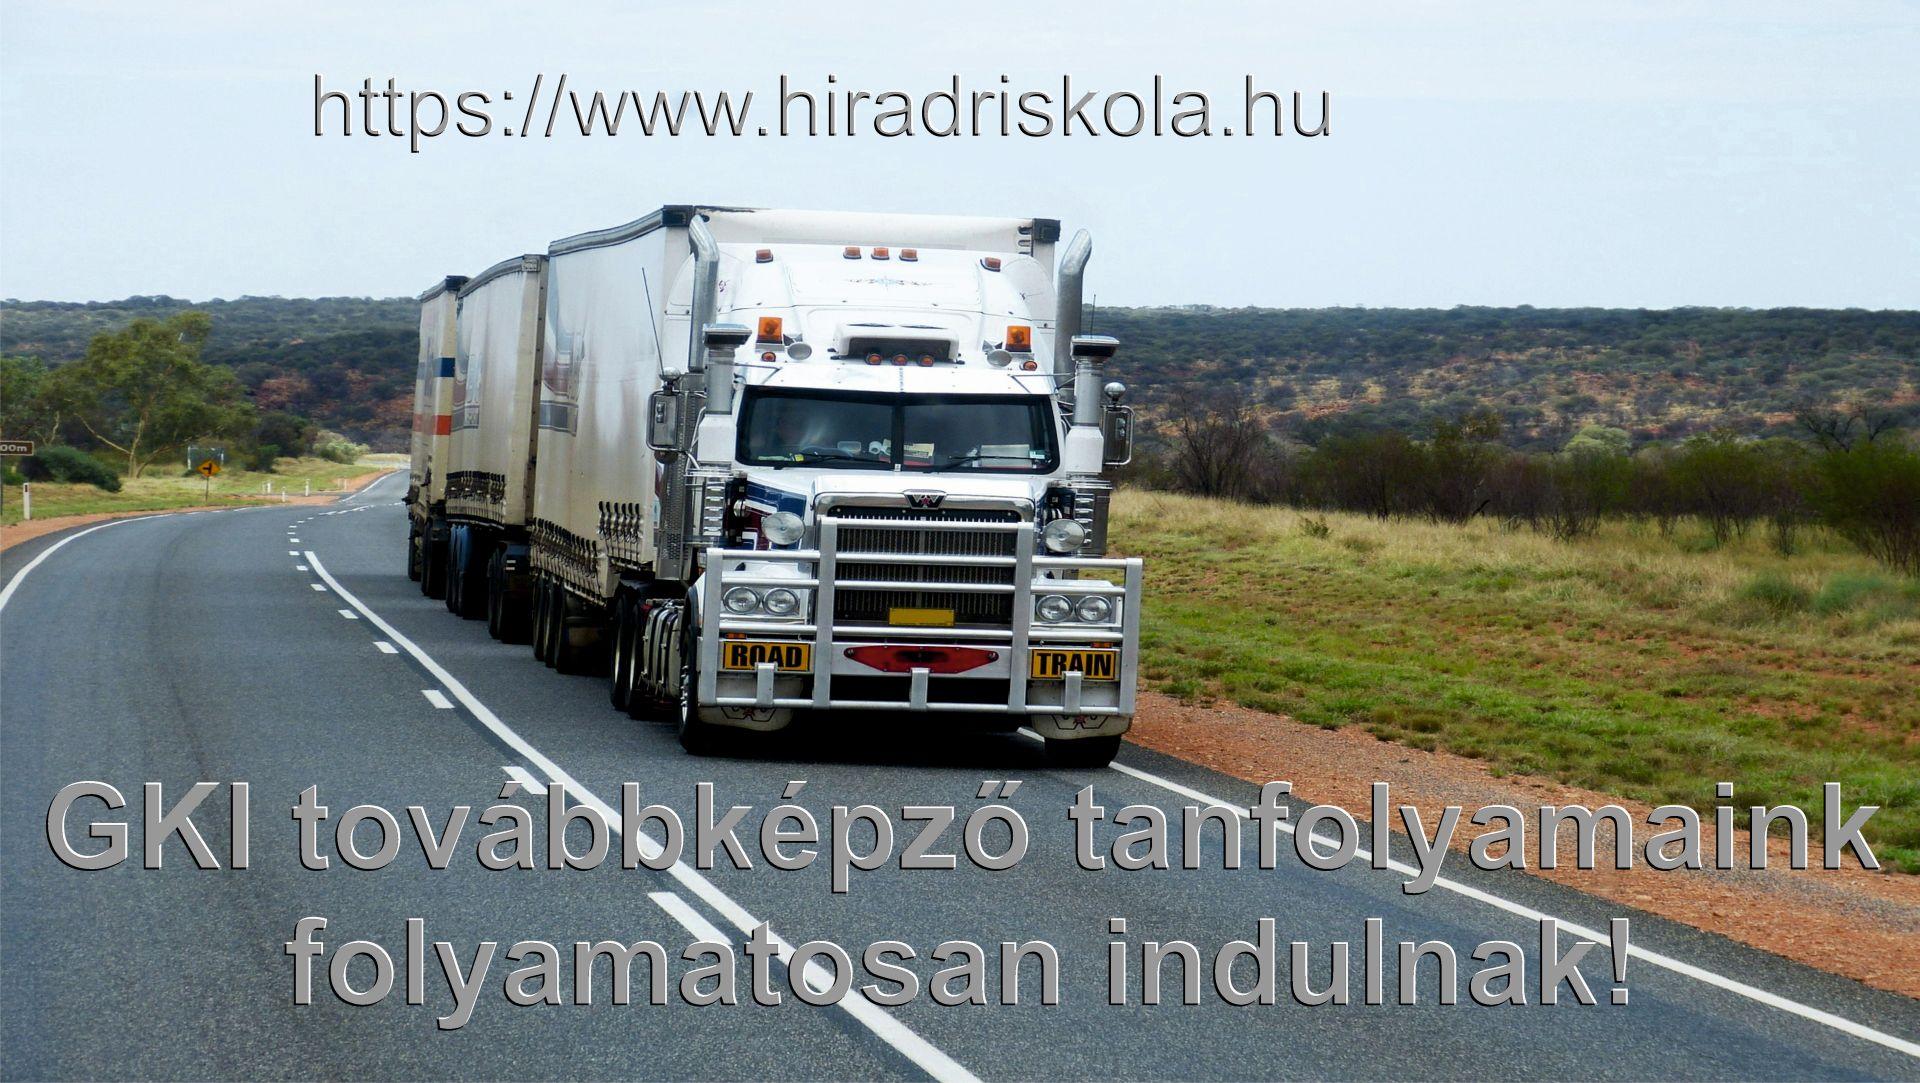 bev-kep-33C6C9628-8B96-468C-AA16-3B8097DA4BFF.jpg